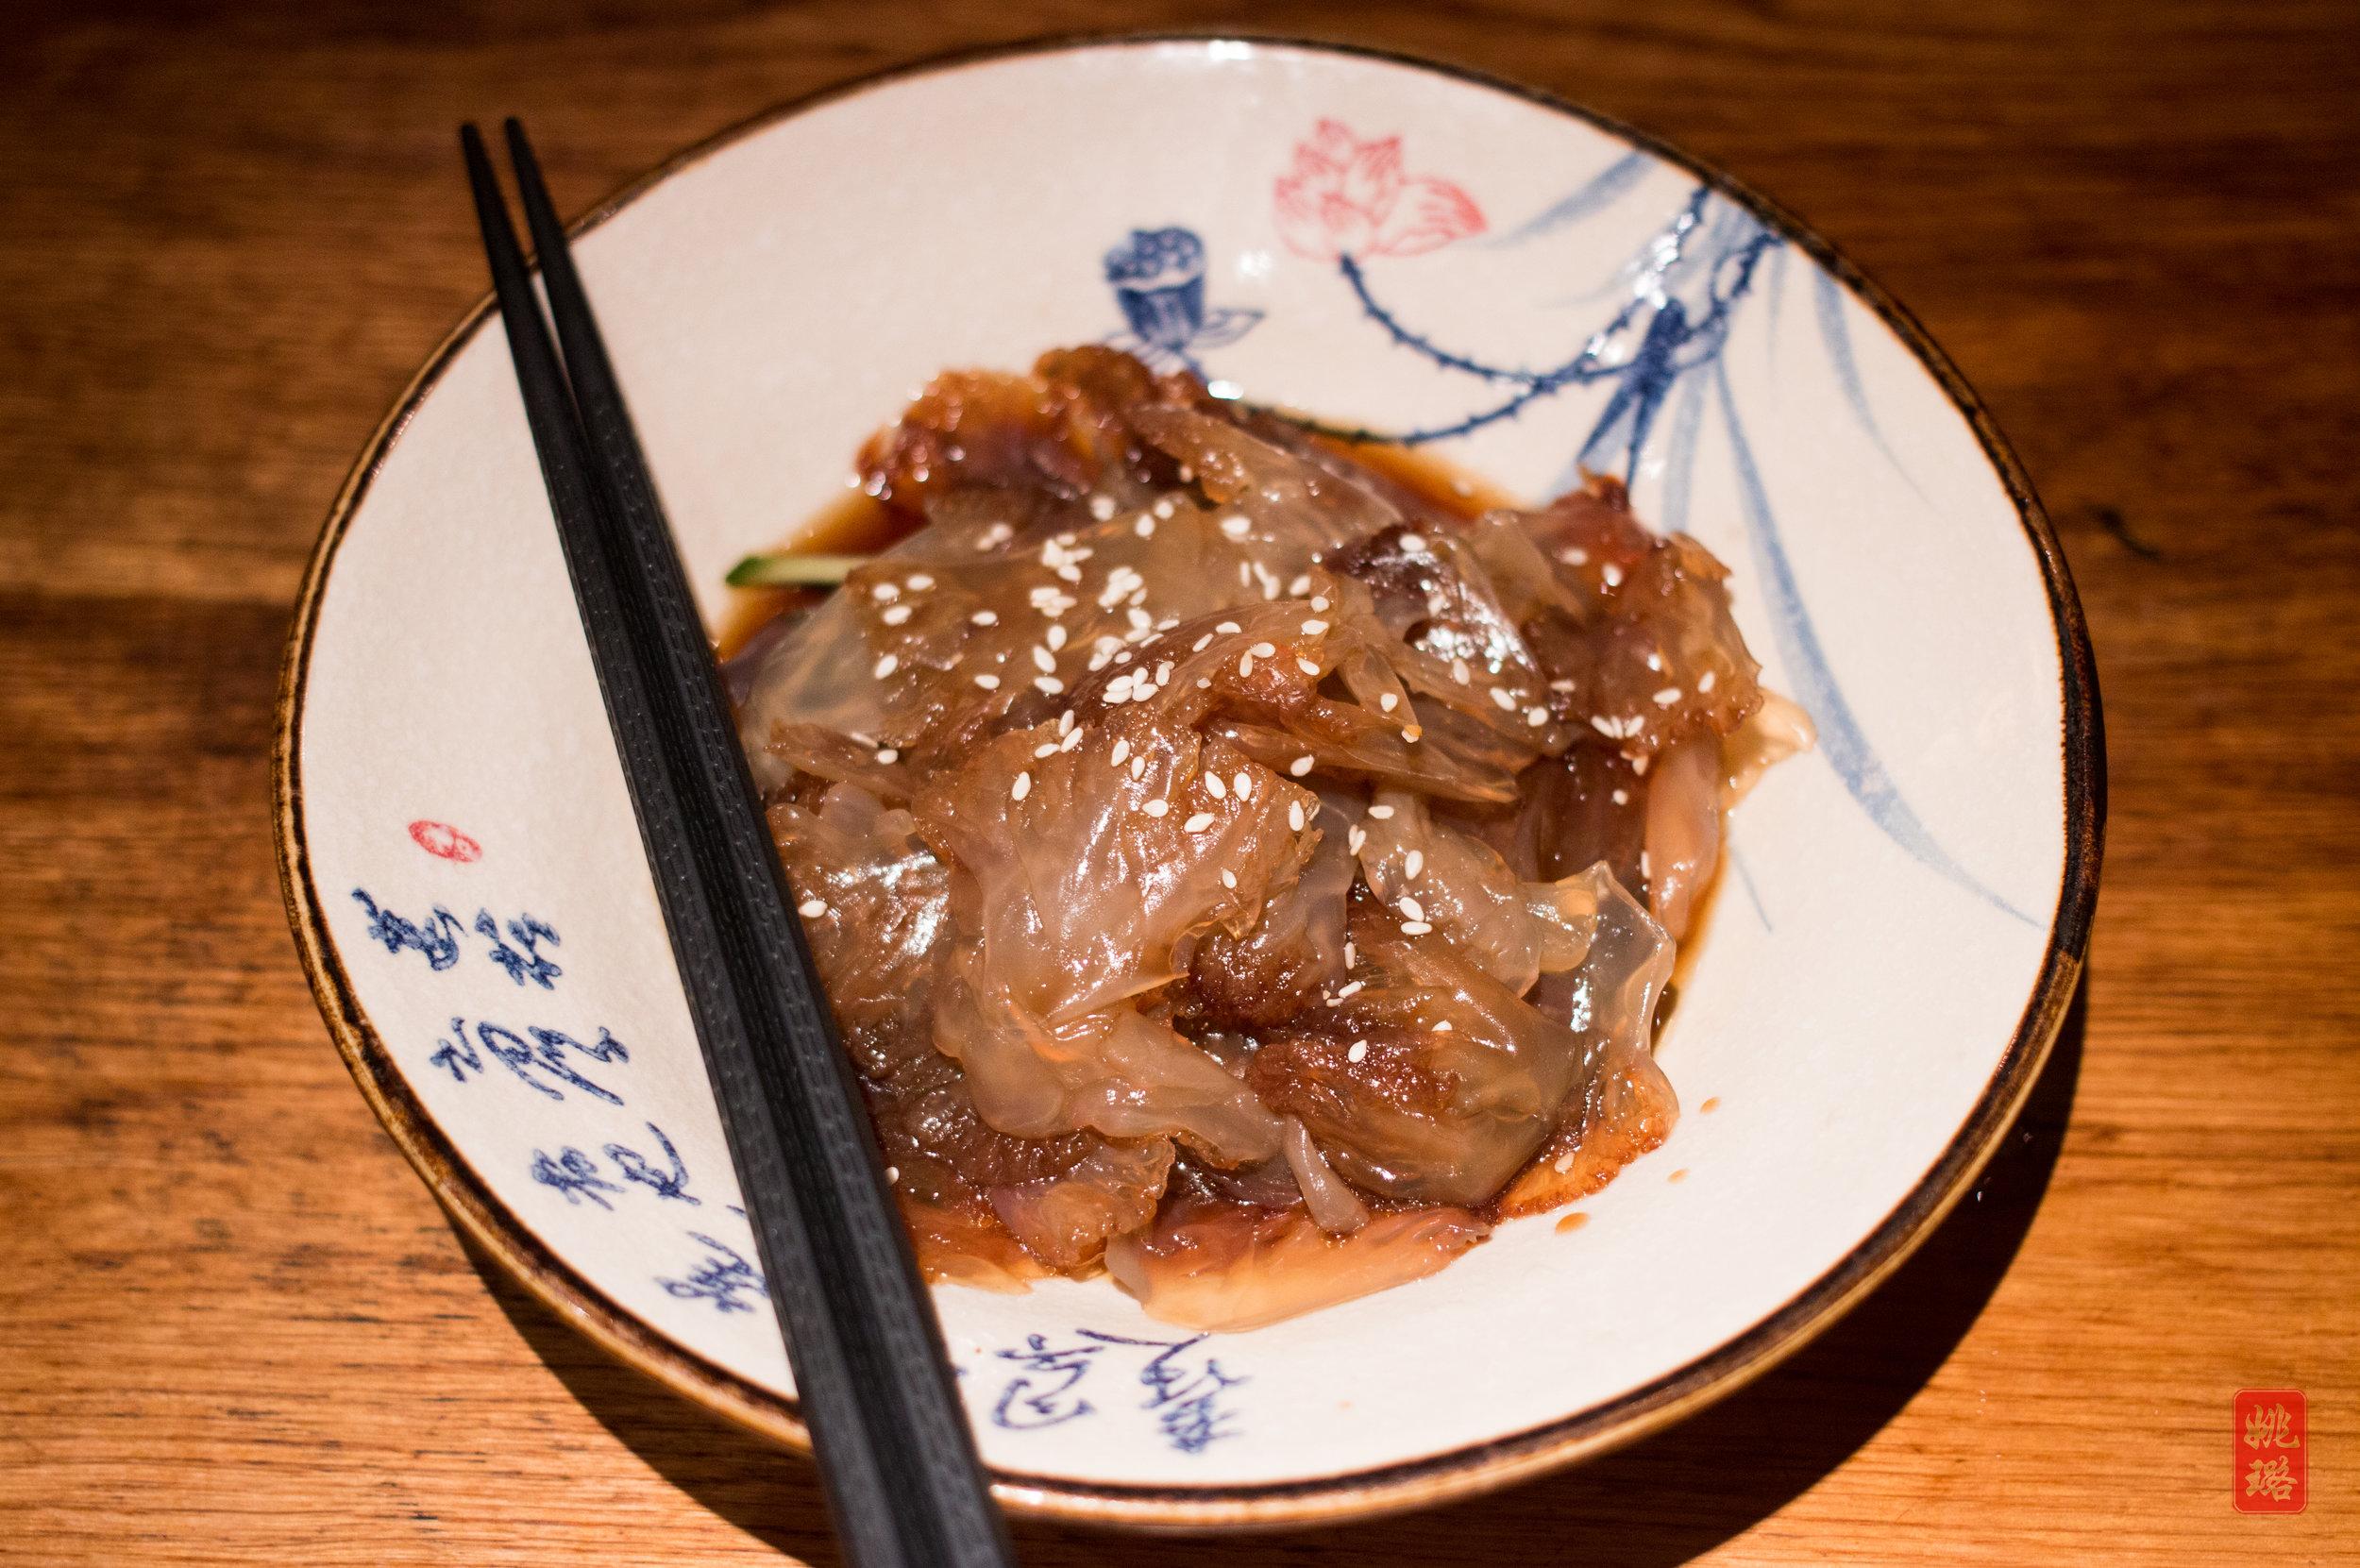 IMG_2080 Szechuan Mountain House - jellyfish salad with aged vinegar.jpg